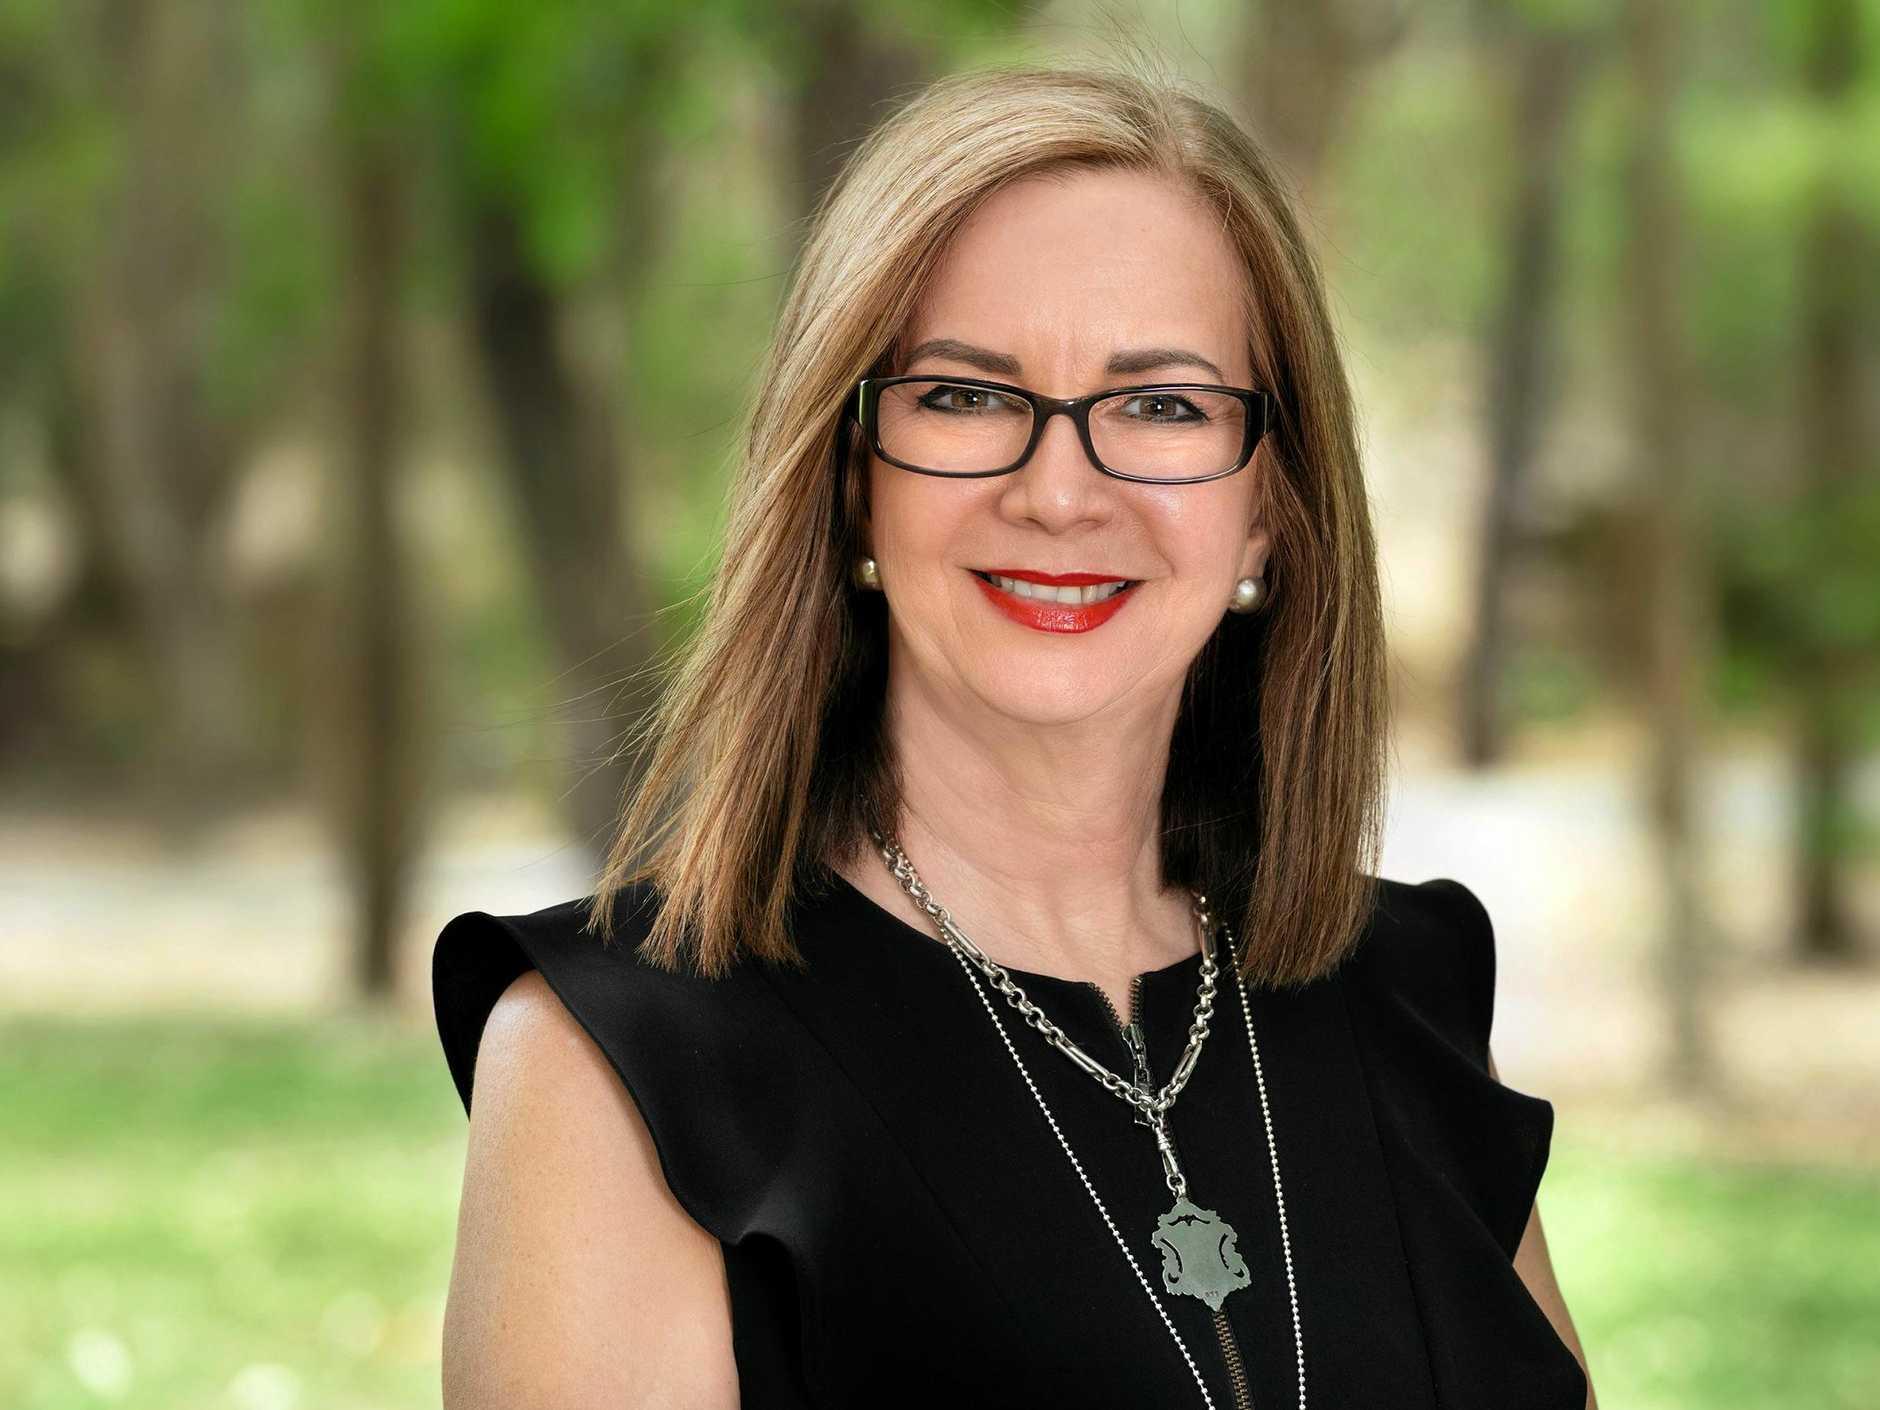 Ray White Rockampton Sales Agent Vicki Deller